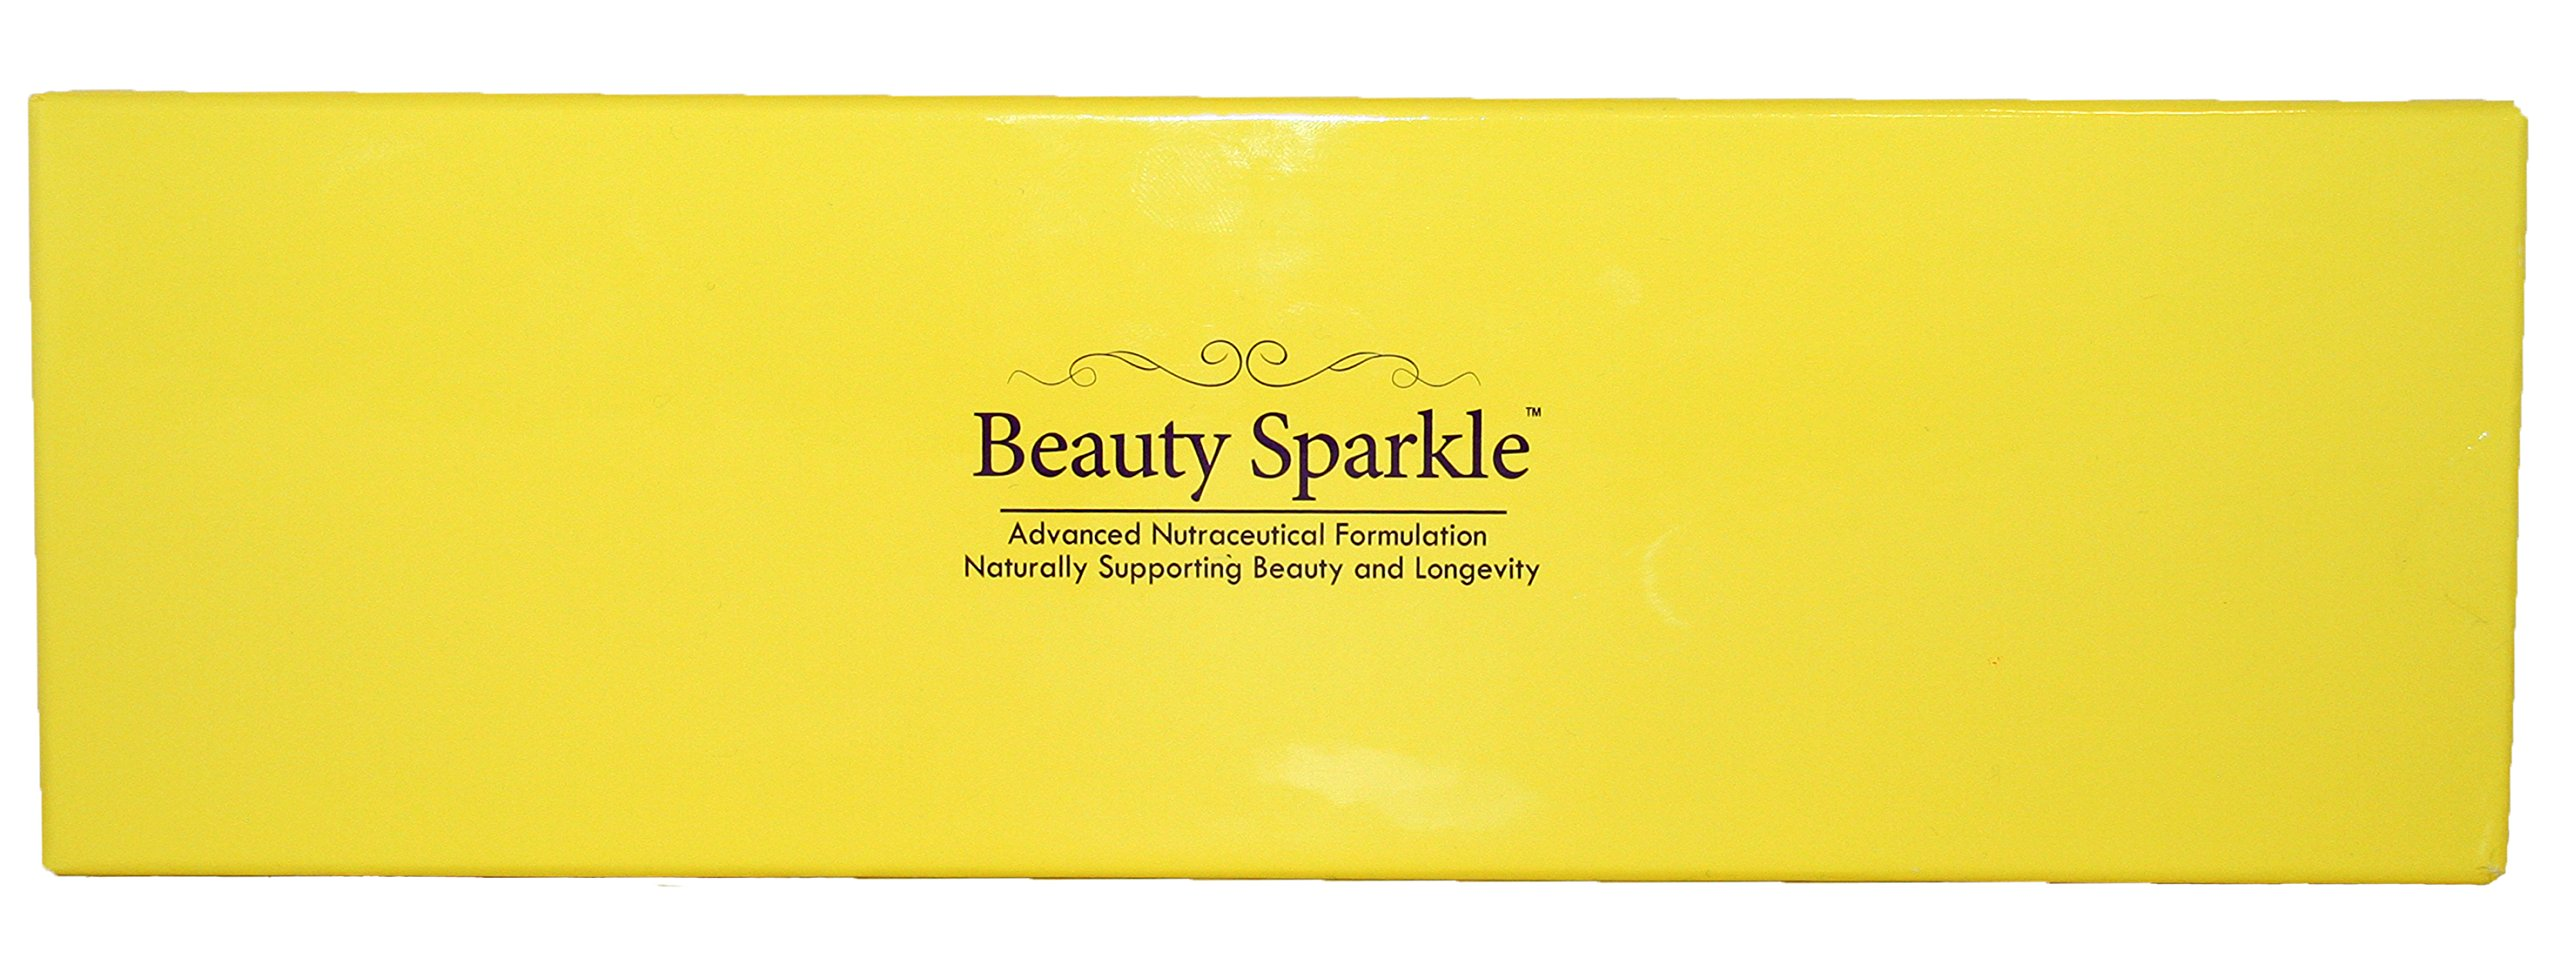 Vision Smart Center - Beauty Sparkle Active Blackcurrant Antioxidant and Anti-Glycation Mangostin VINOFELON Trans-Resveratrol Co-Q10